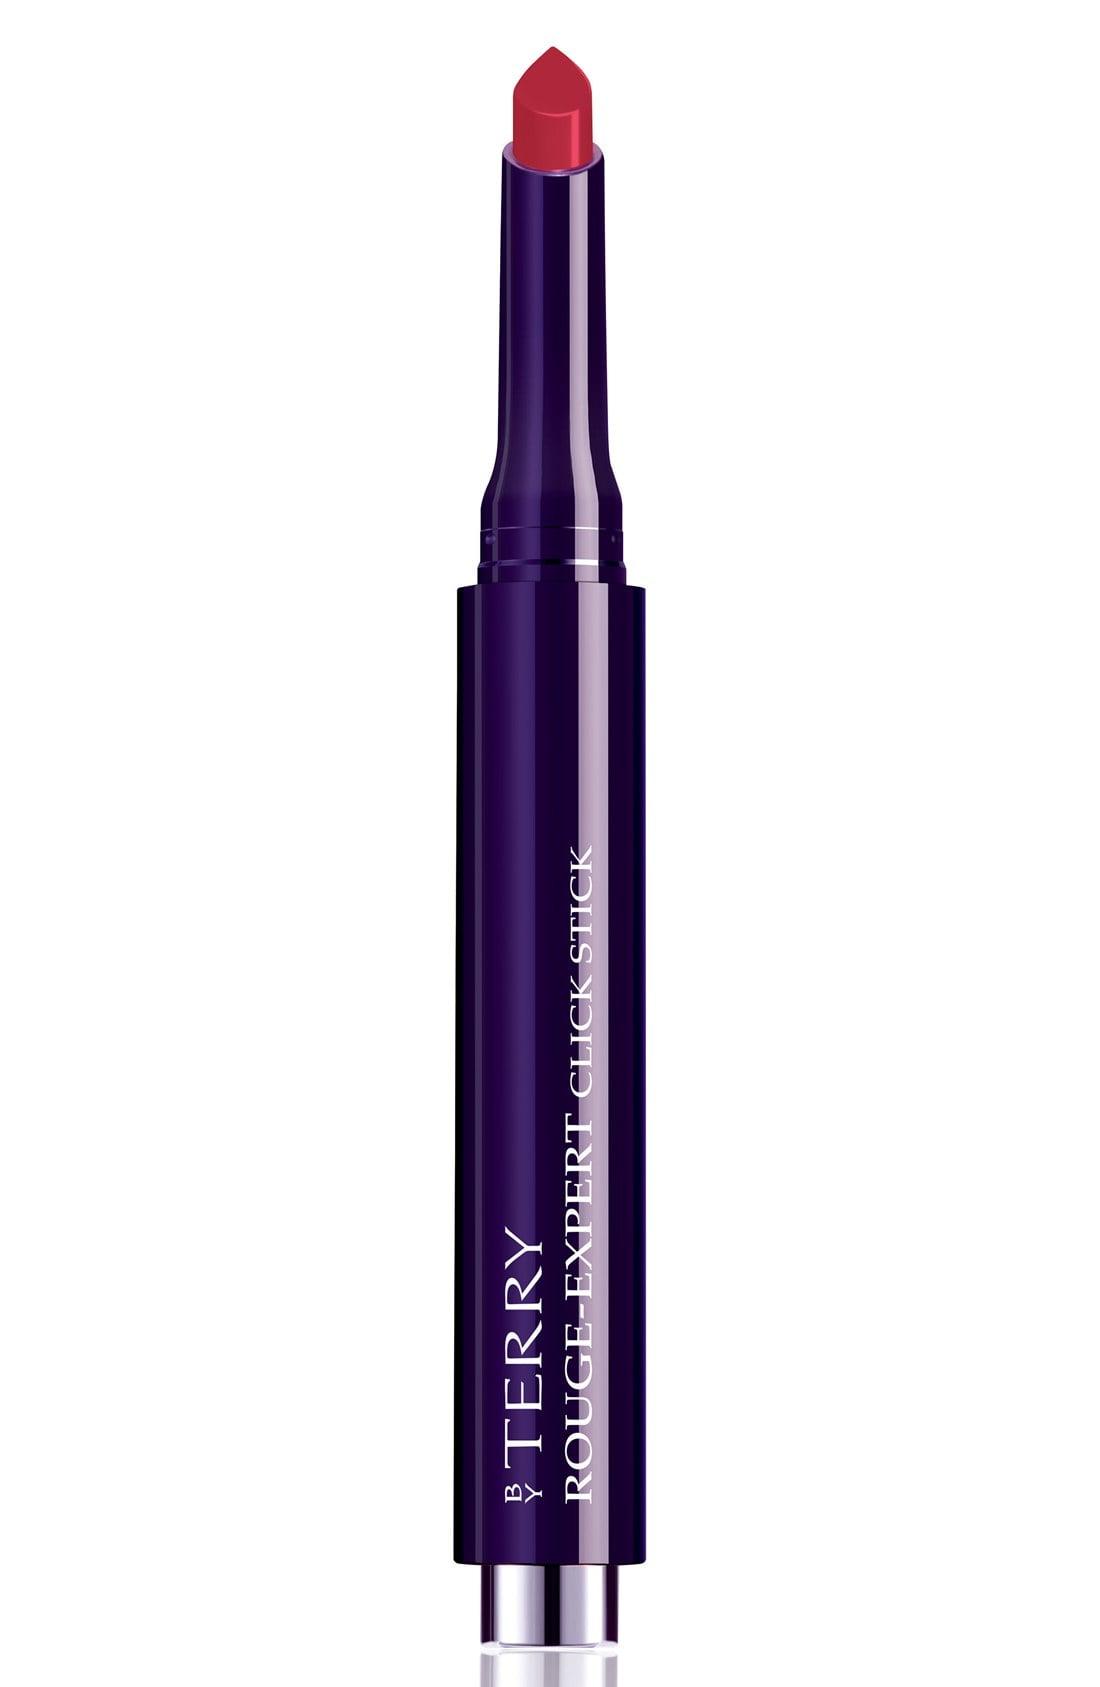 Rouge Expert Click Stick Lipstick - 18 Be Mine